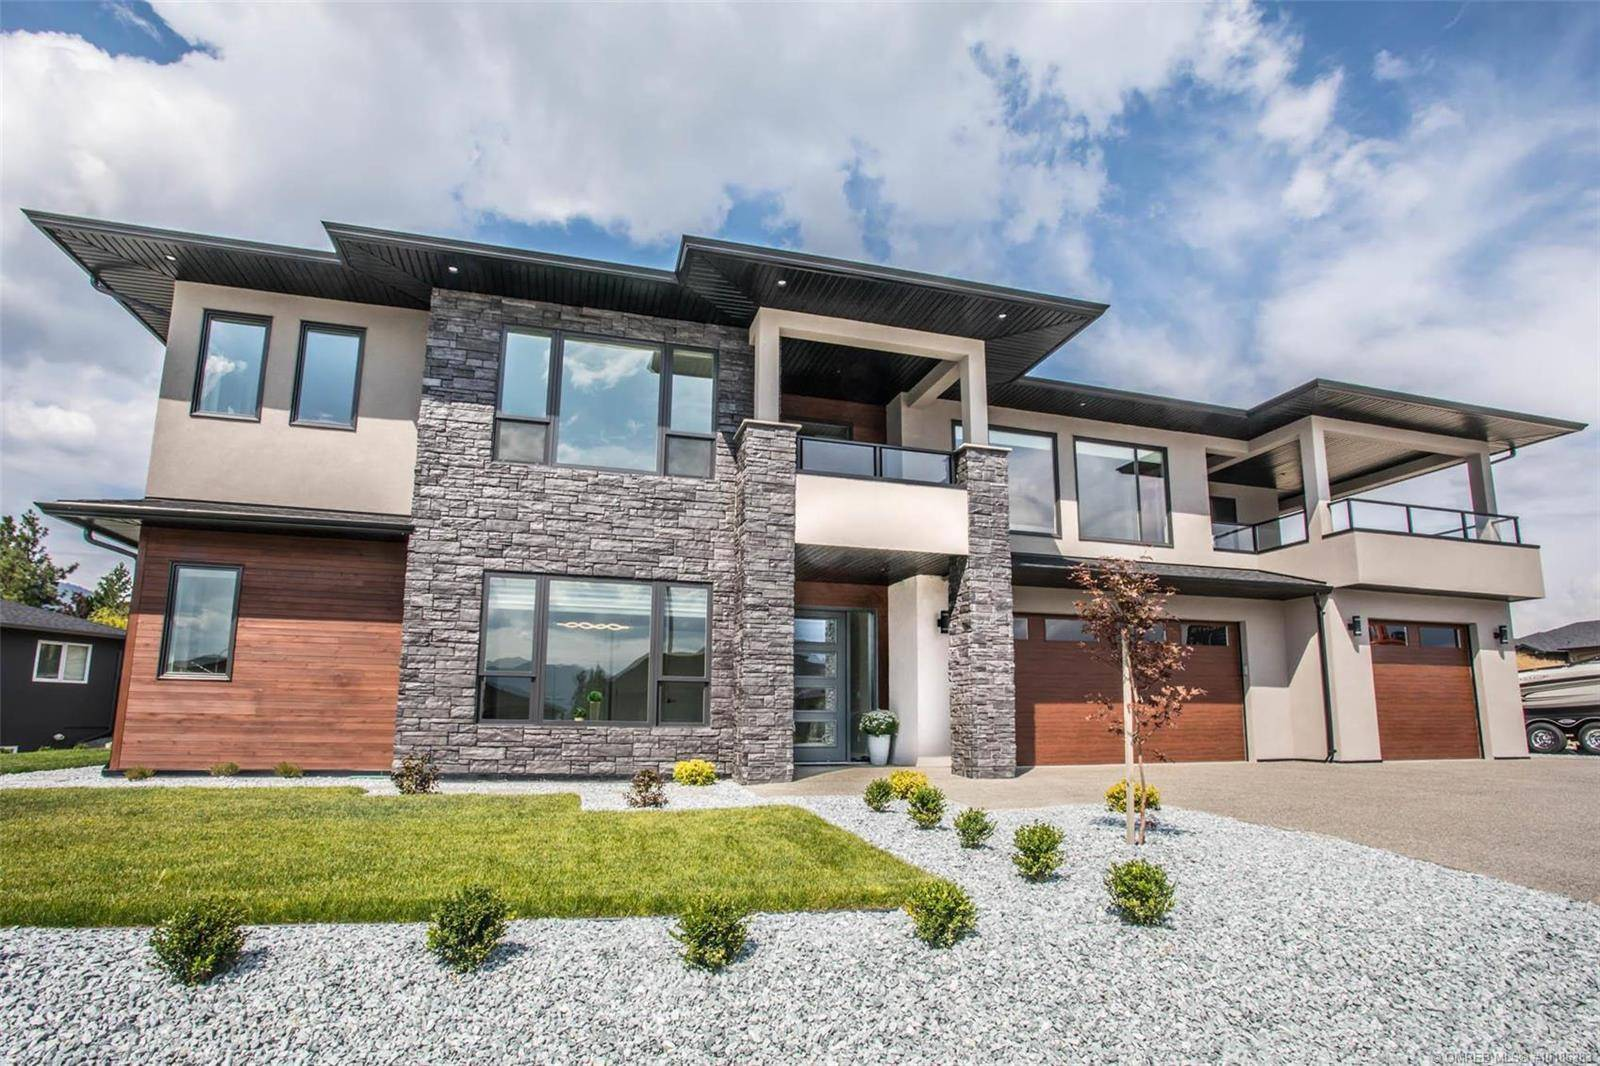 House for sale at 3280 Vineyard View Dr West Kelowna British Columbia - MLS: 10186383